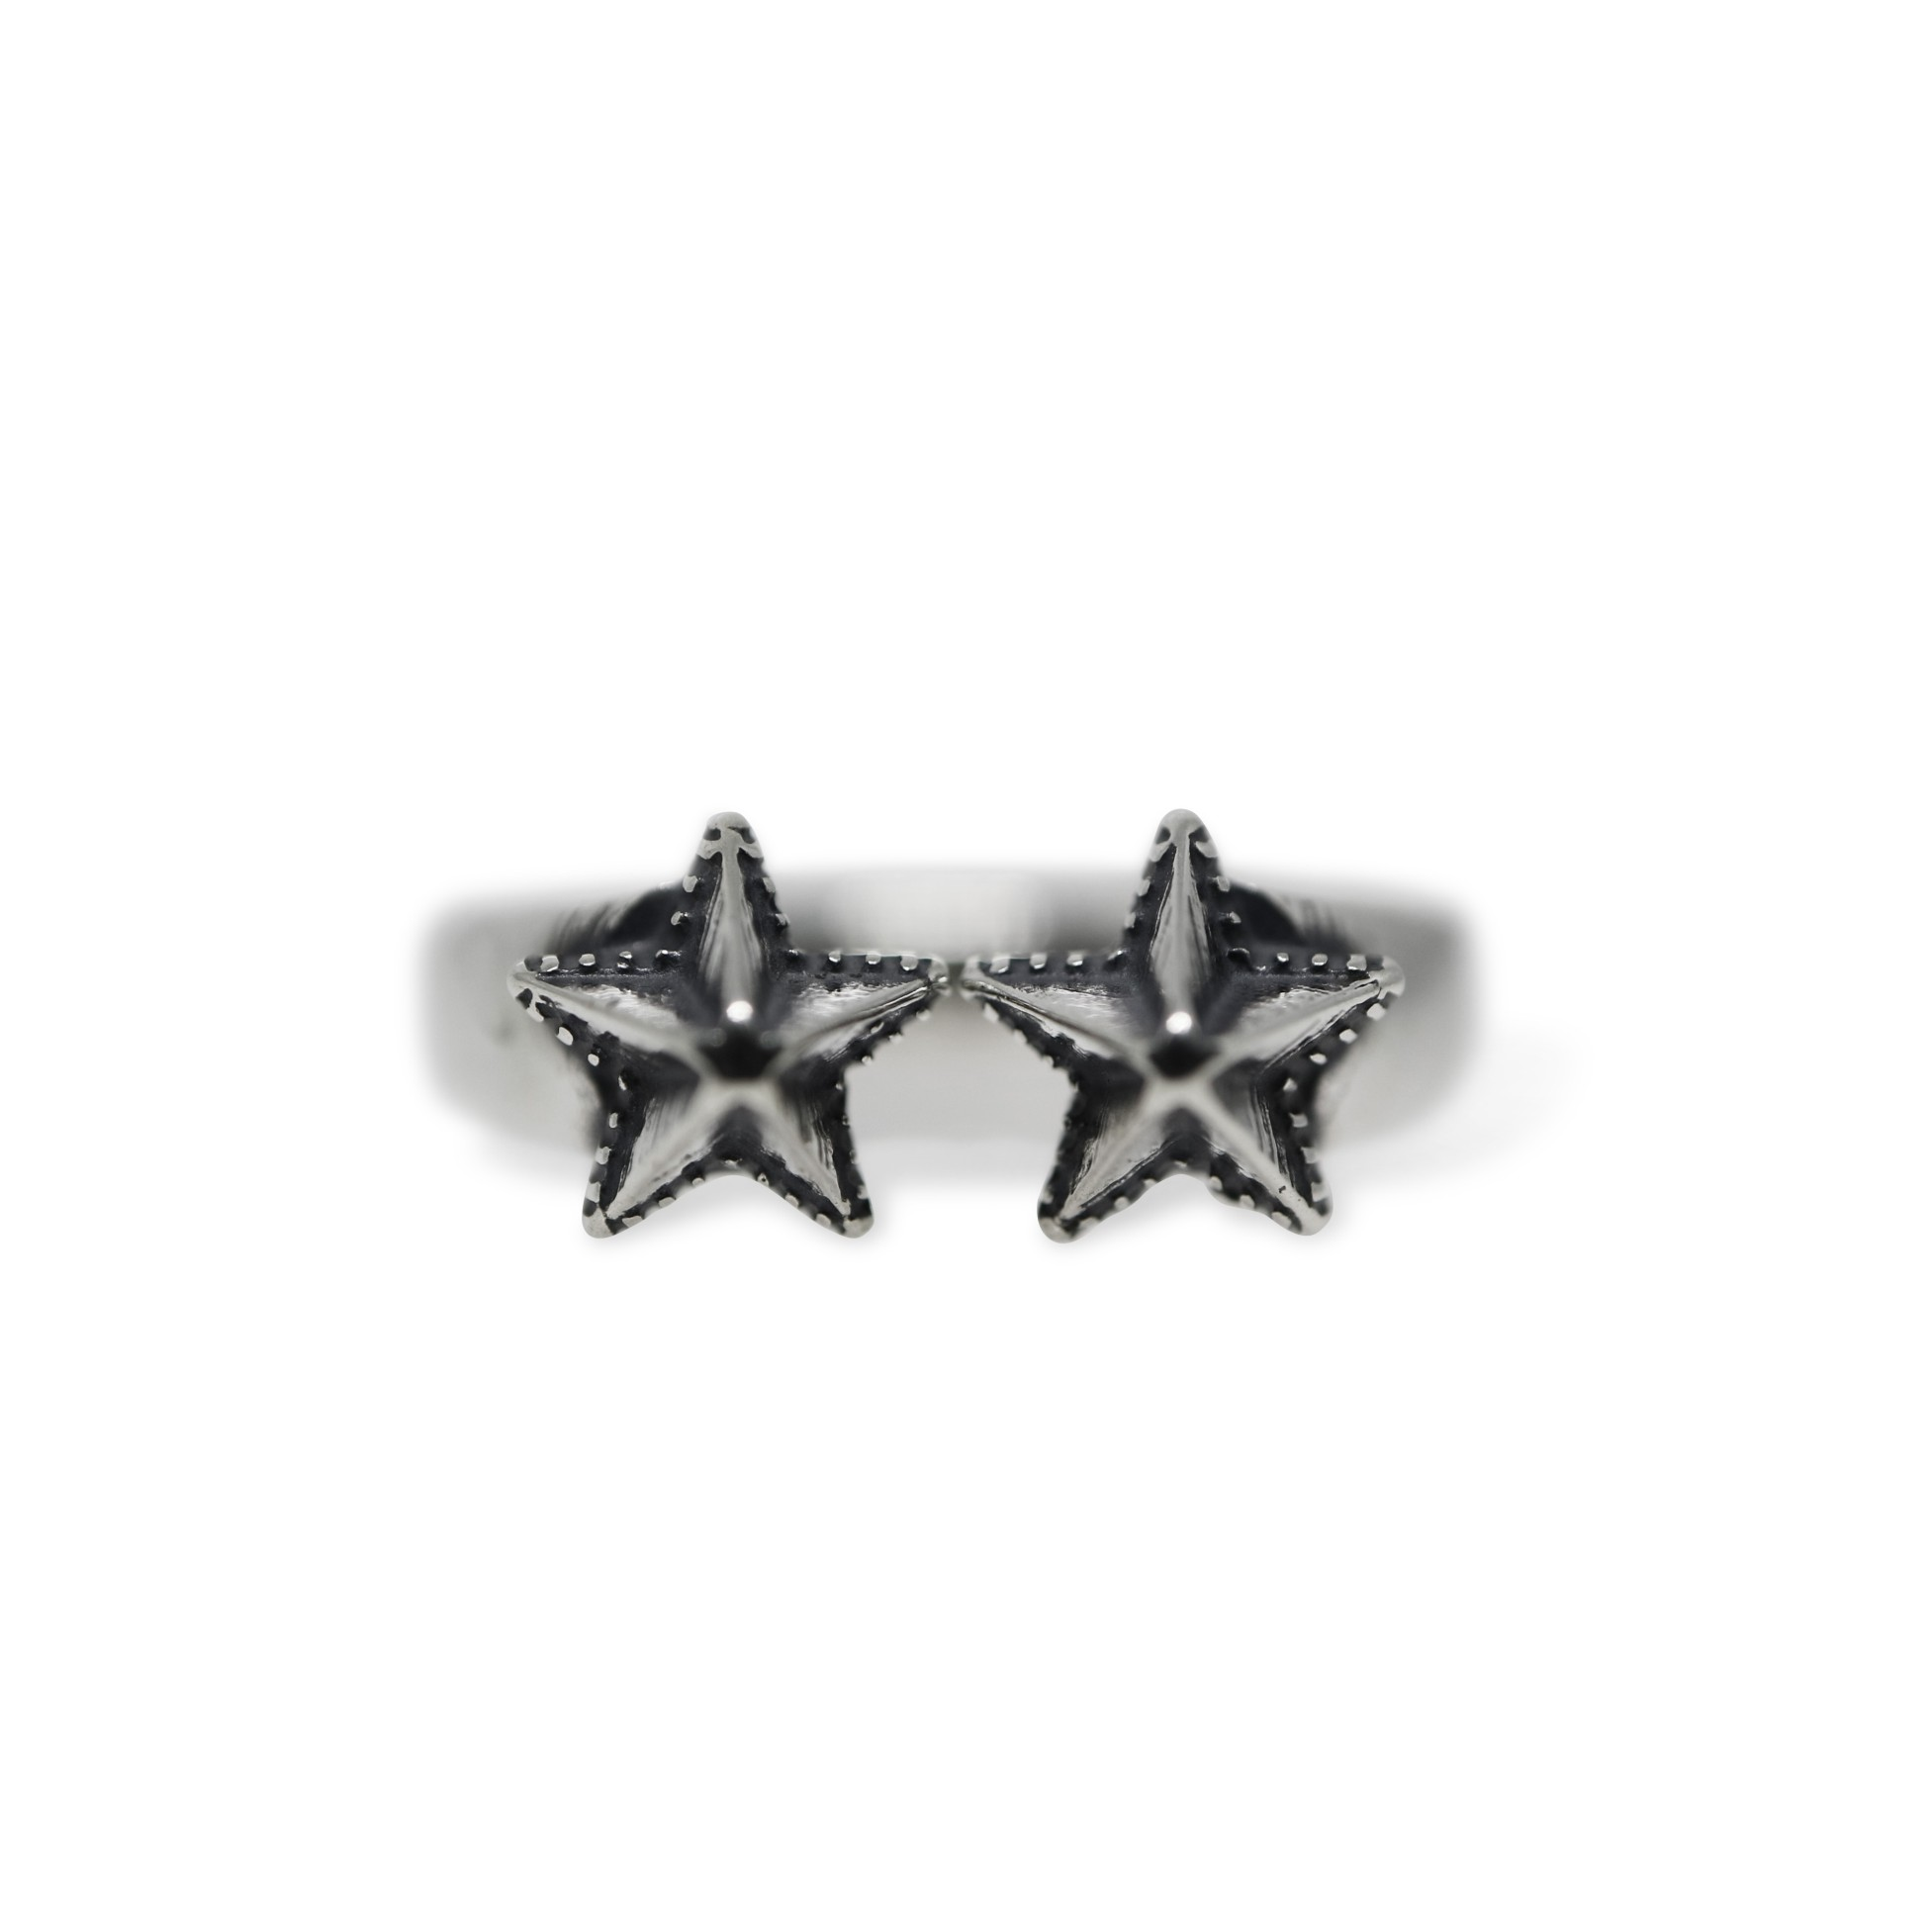 ADJUSTABLE HIGH POINT STAR RING [USD $460]